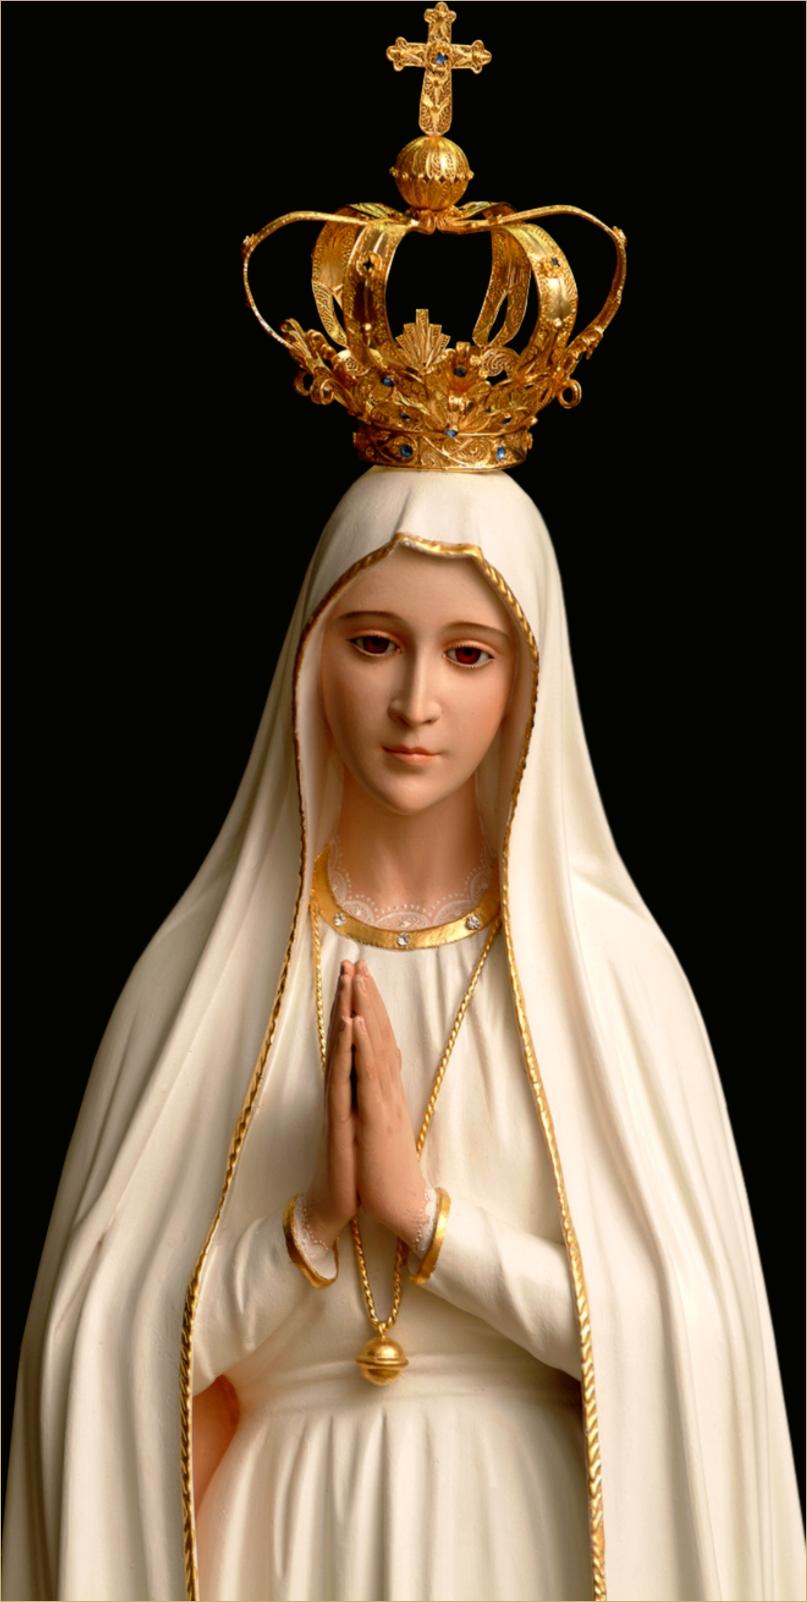 Mary with infant jesus pictures St. Joseph - Saints Angels - Catholic Online